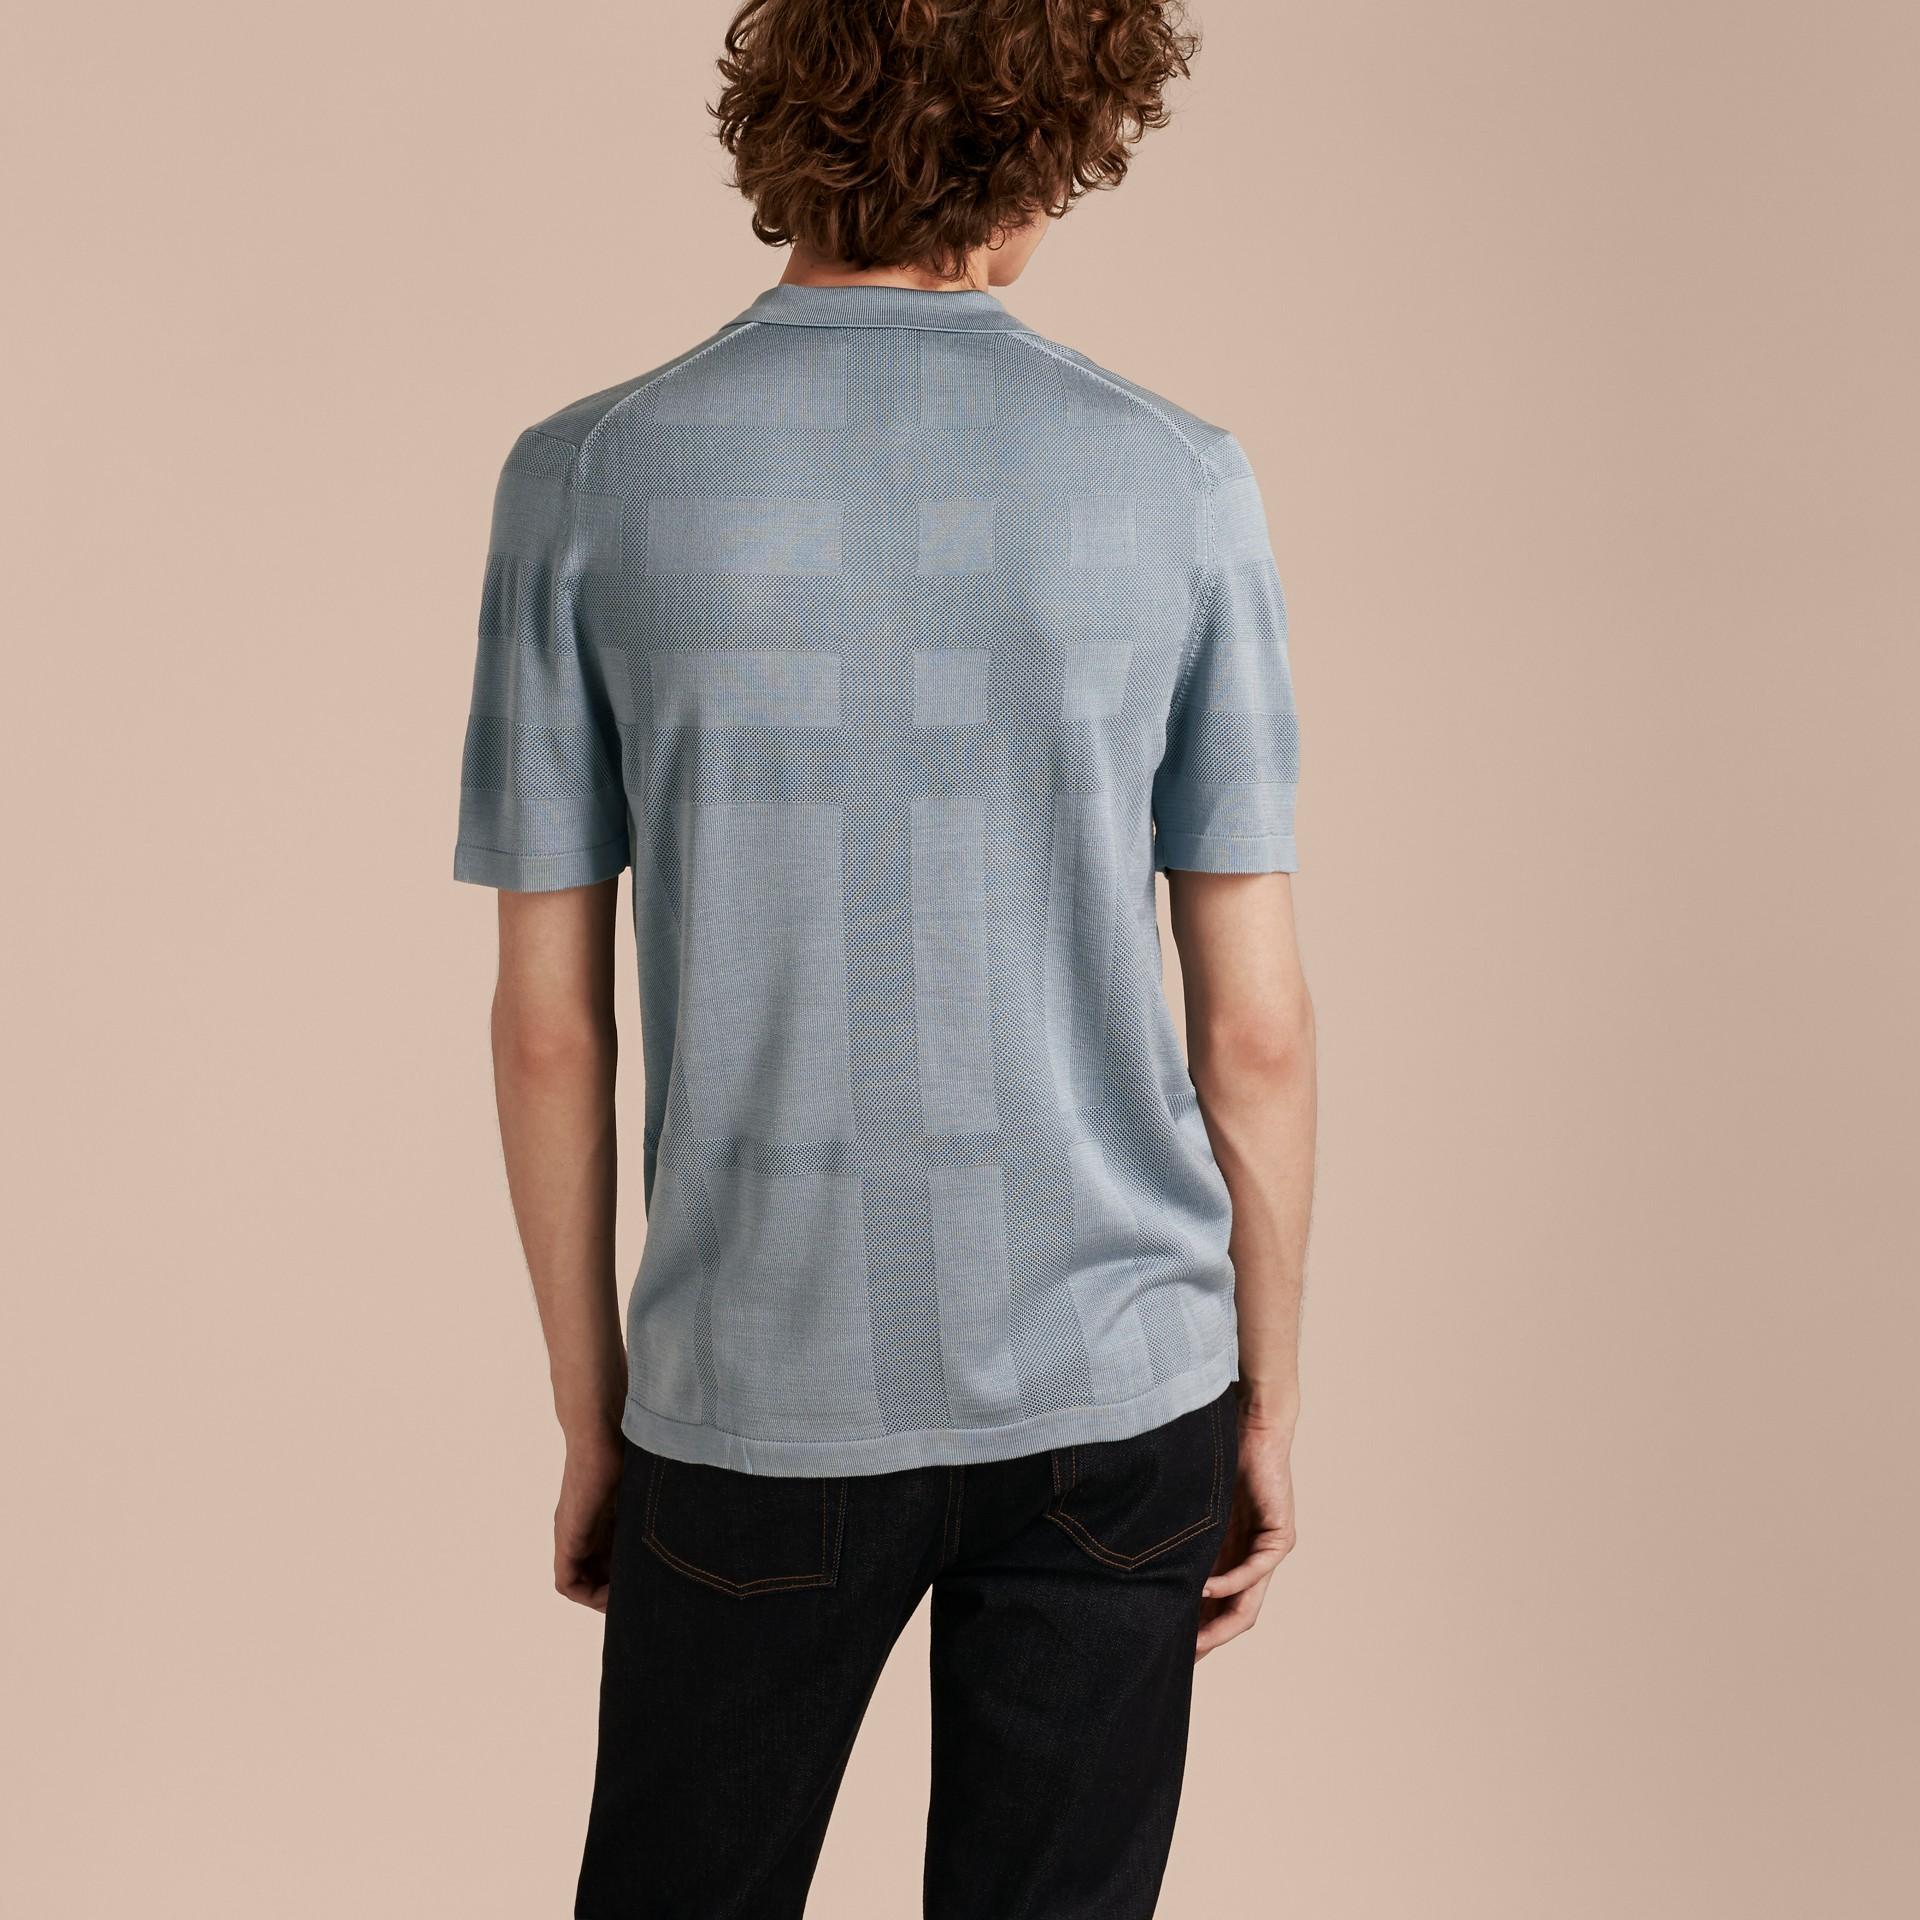 Check Jacquard Piqué Silk Cotton Polo Shirt in Slate Blue - Men | Burberry Singapore - gallery image 3